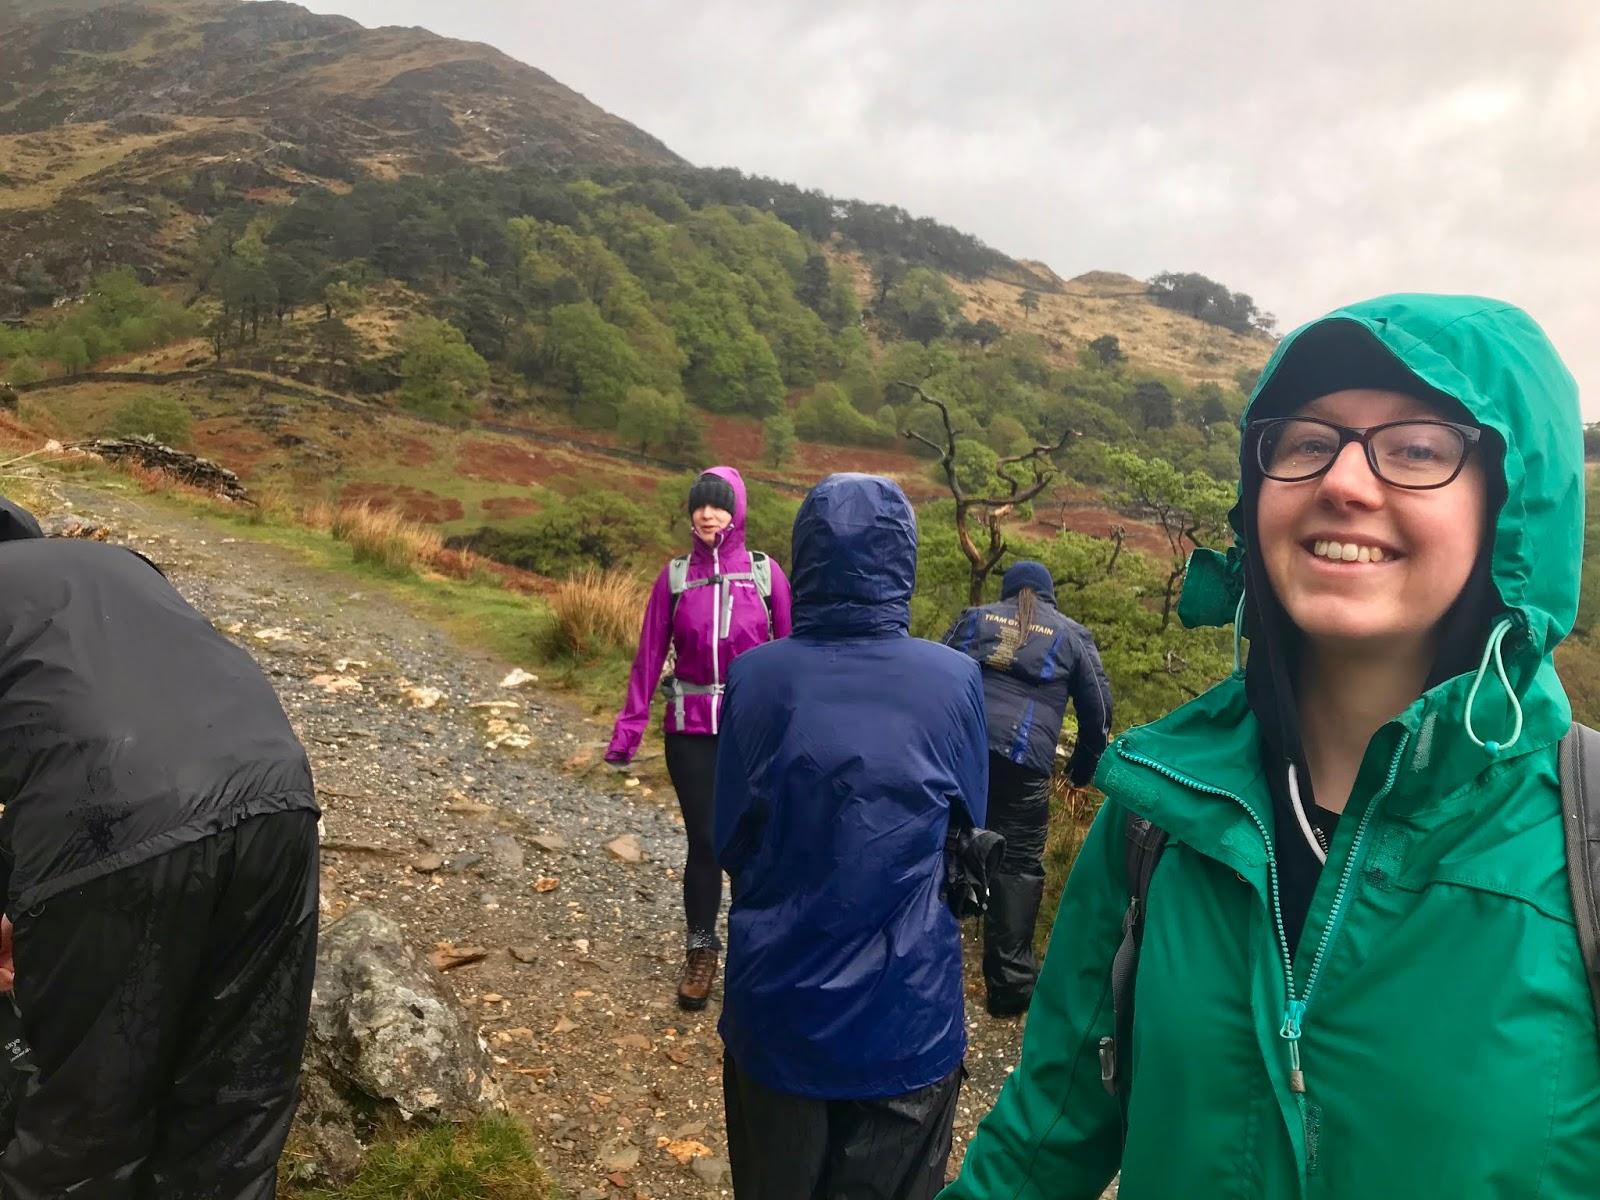 Maggie May - Weekend in Snowdonia